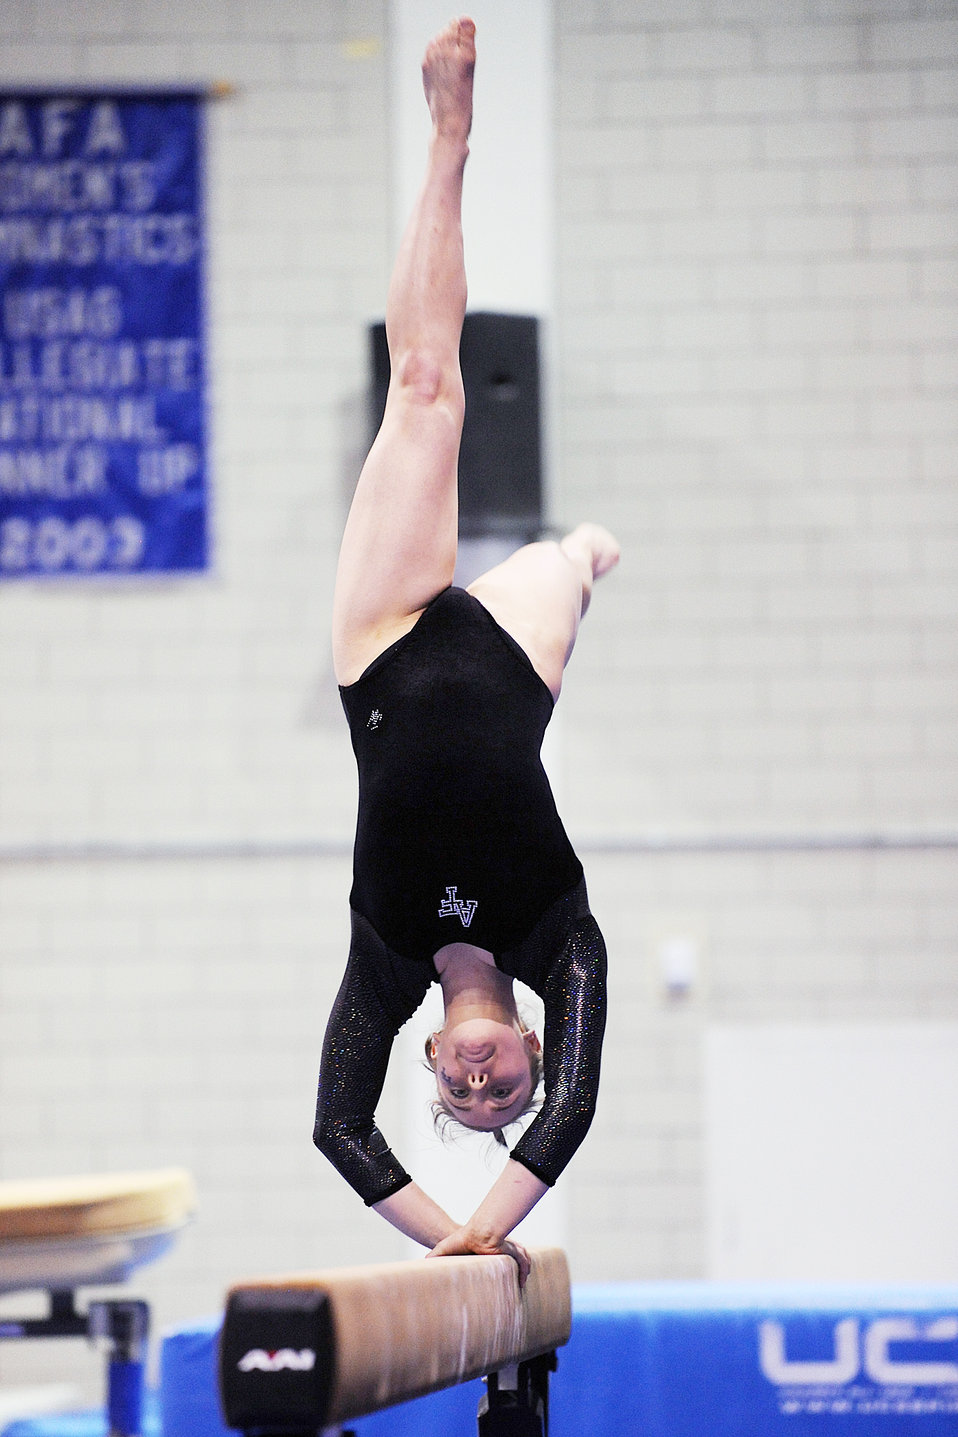 A gymnast on a balance beam